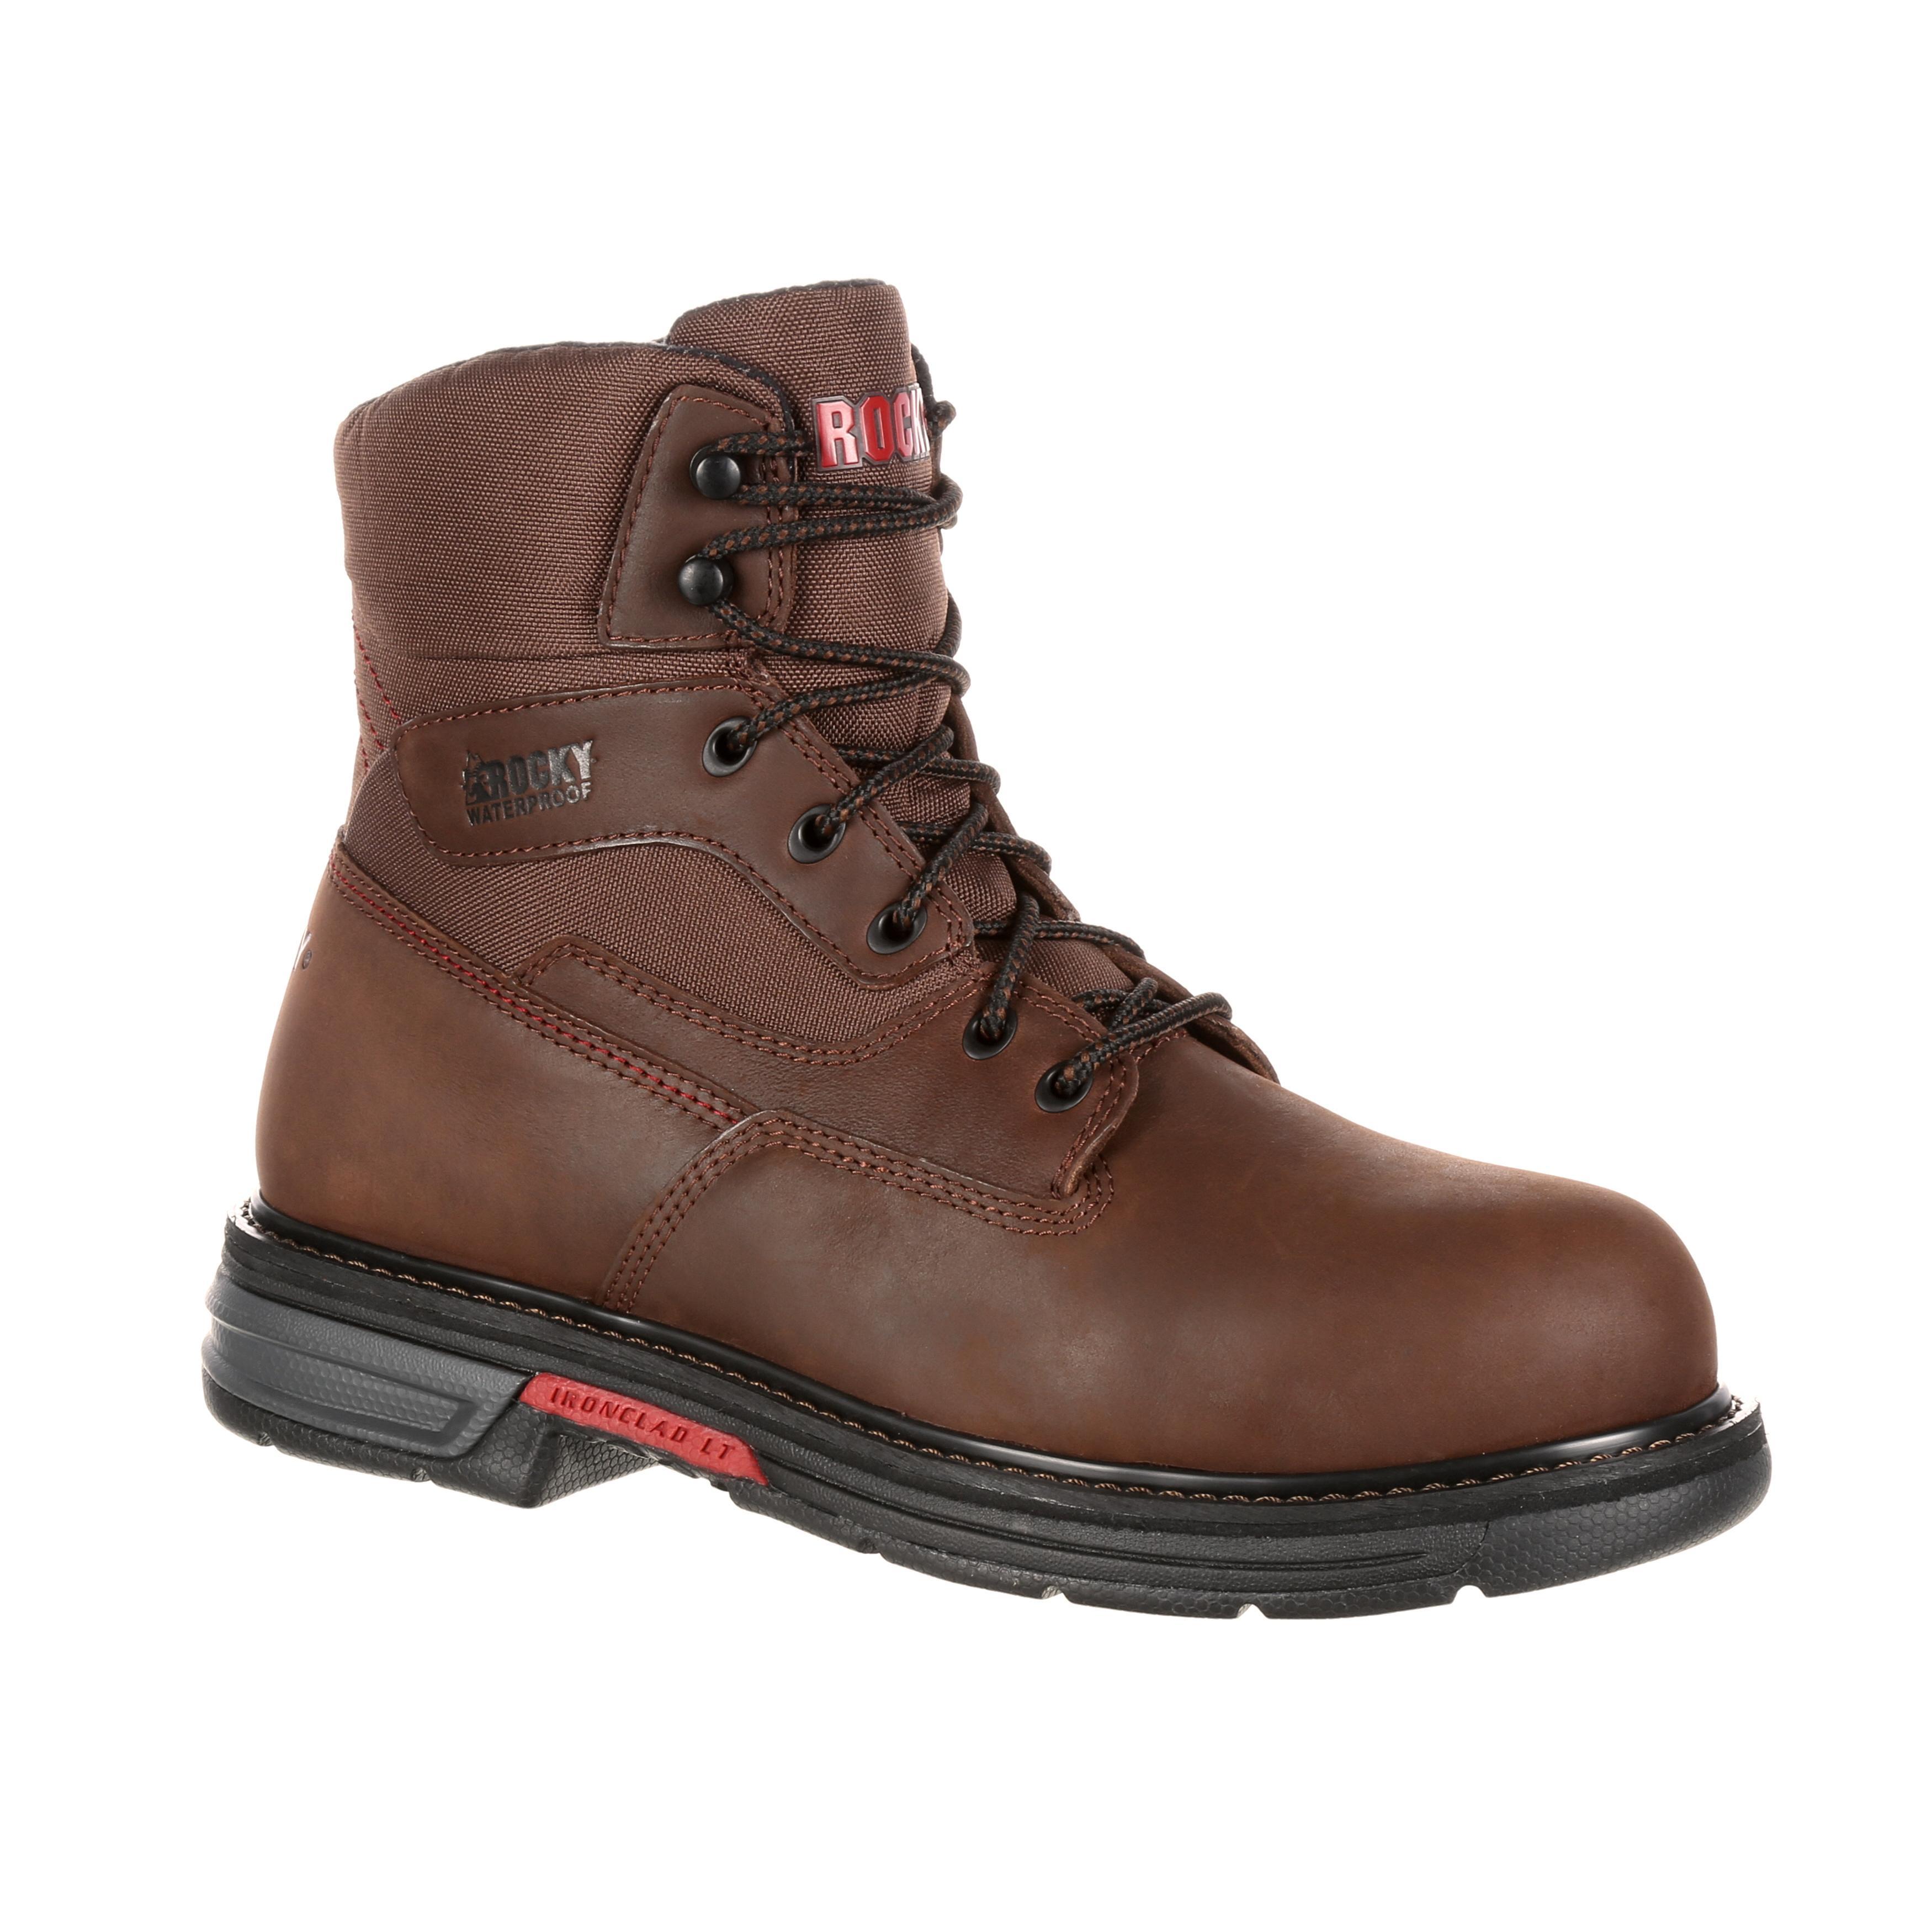 Rocky Ironclad LT: Men's Lightweight Waterproof Work Boots